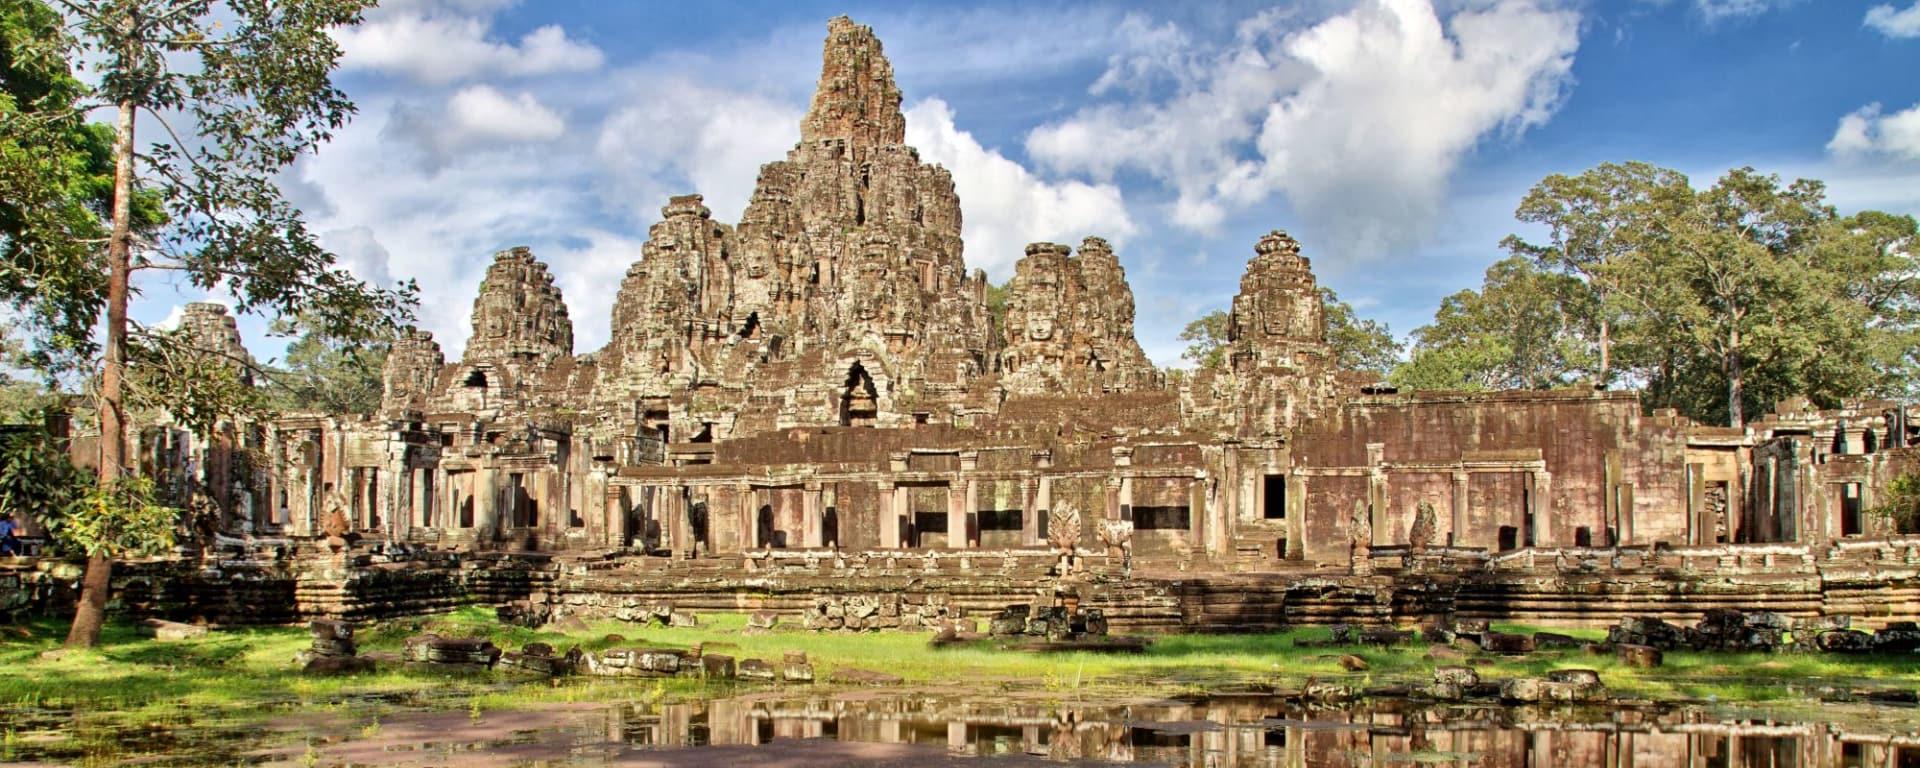 Voyages en Cambodge | Vacances en Asie par tourasia: Siem Reap Angkor Thom